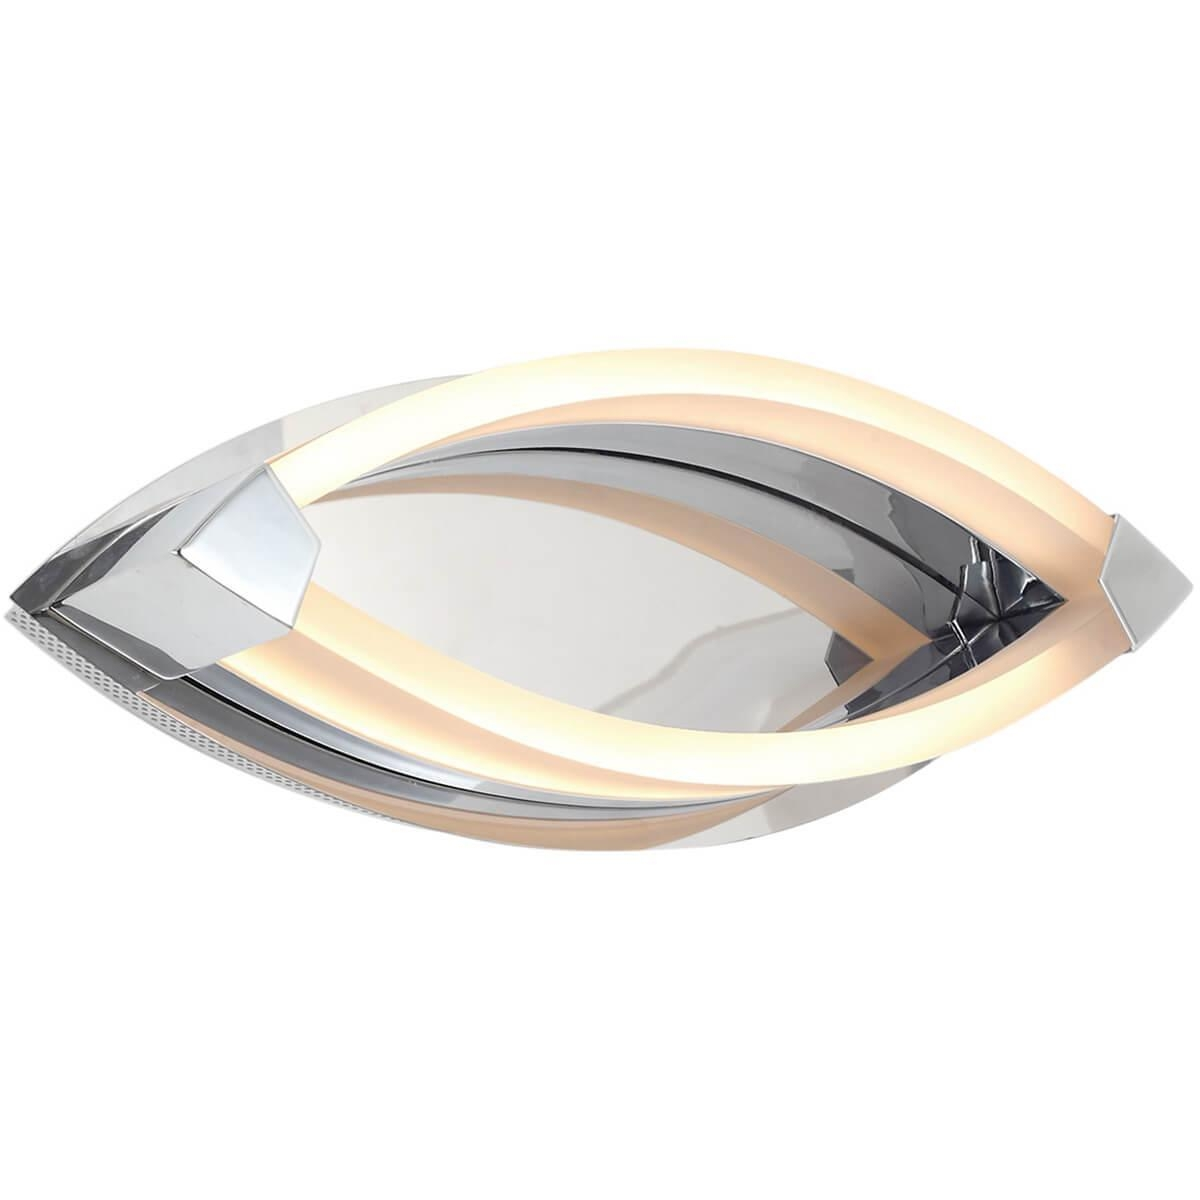 Modena W172.1 Large LED400 Настенный светильник Lucia Tucci